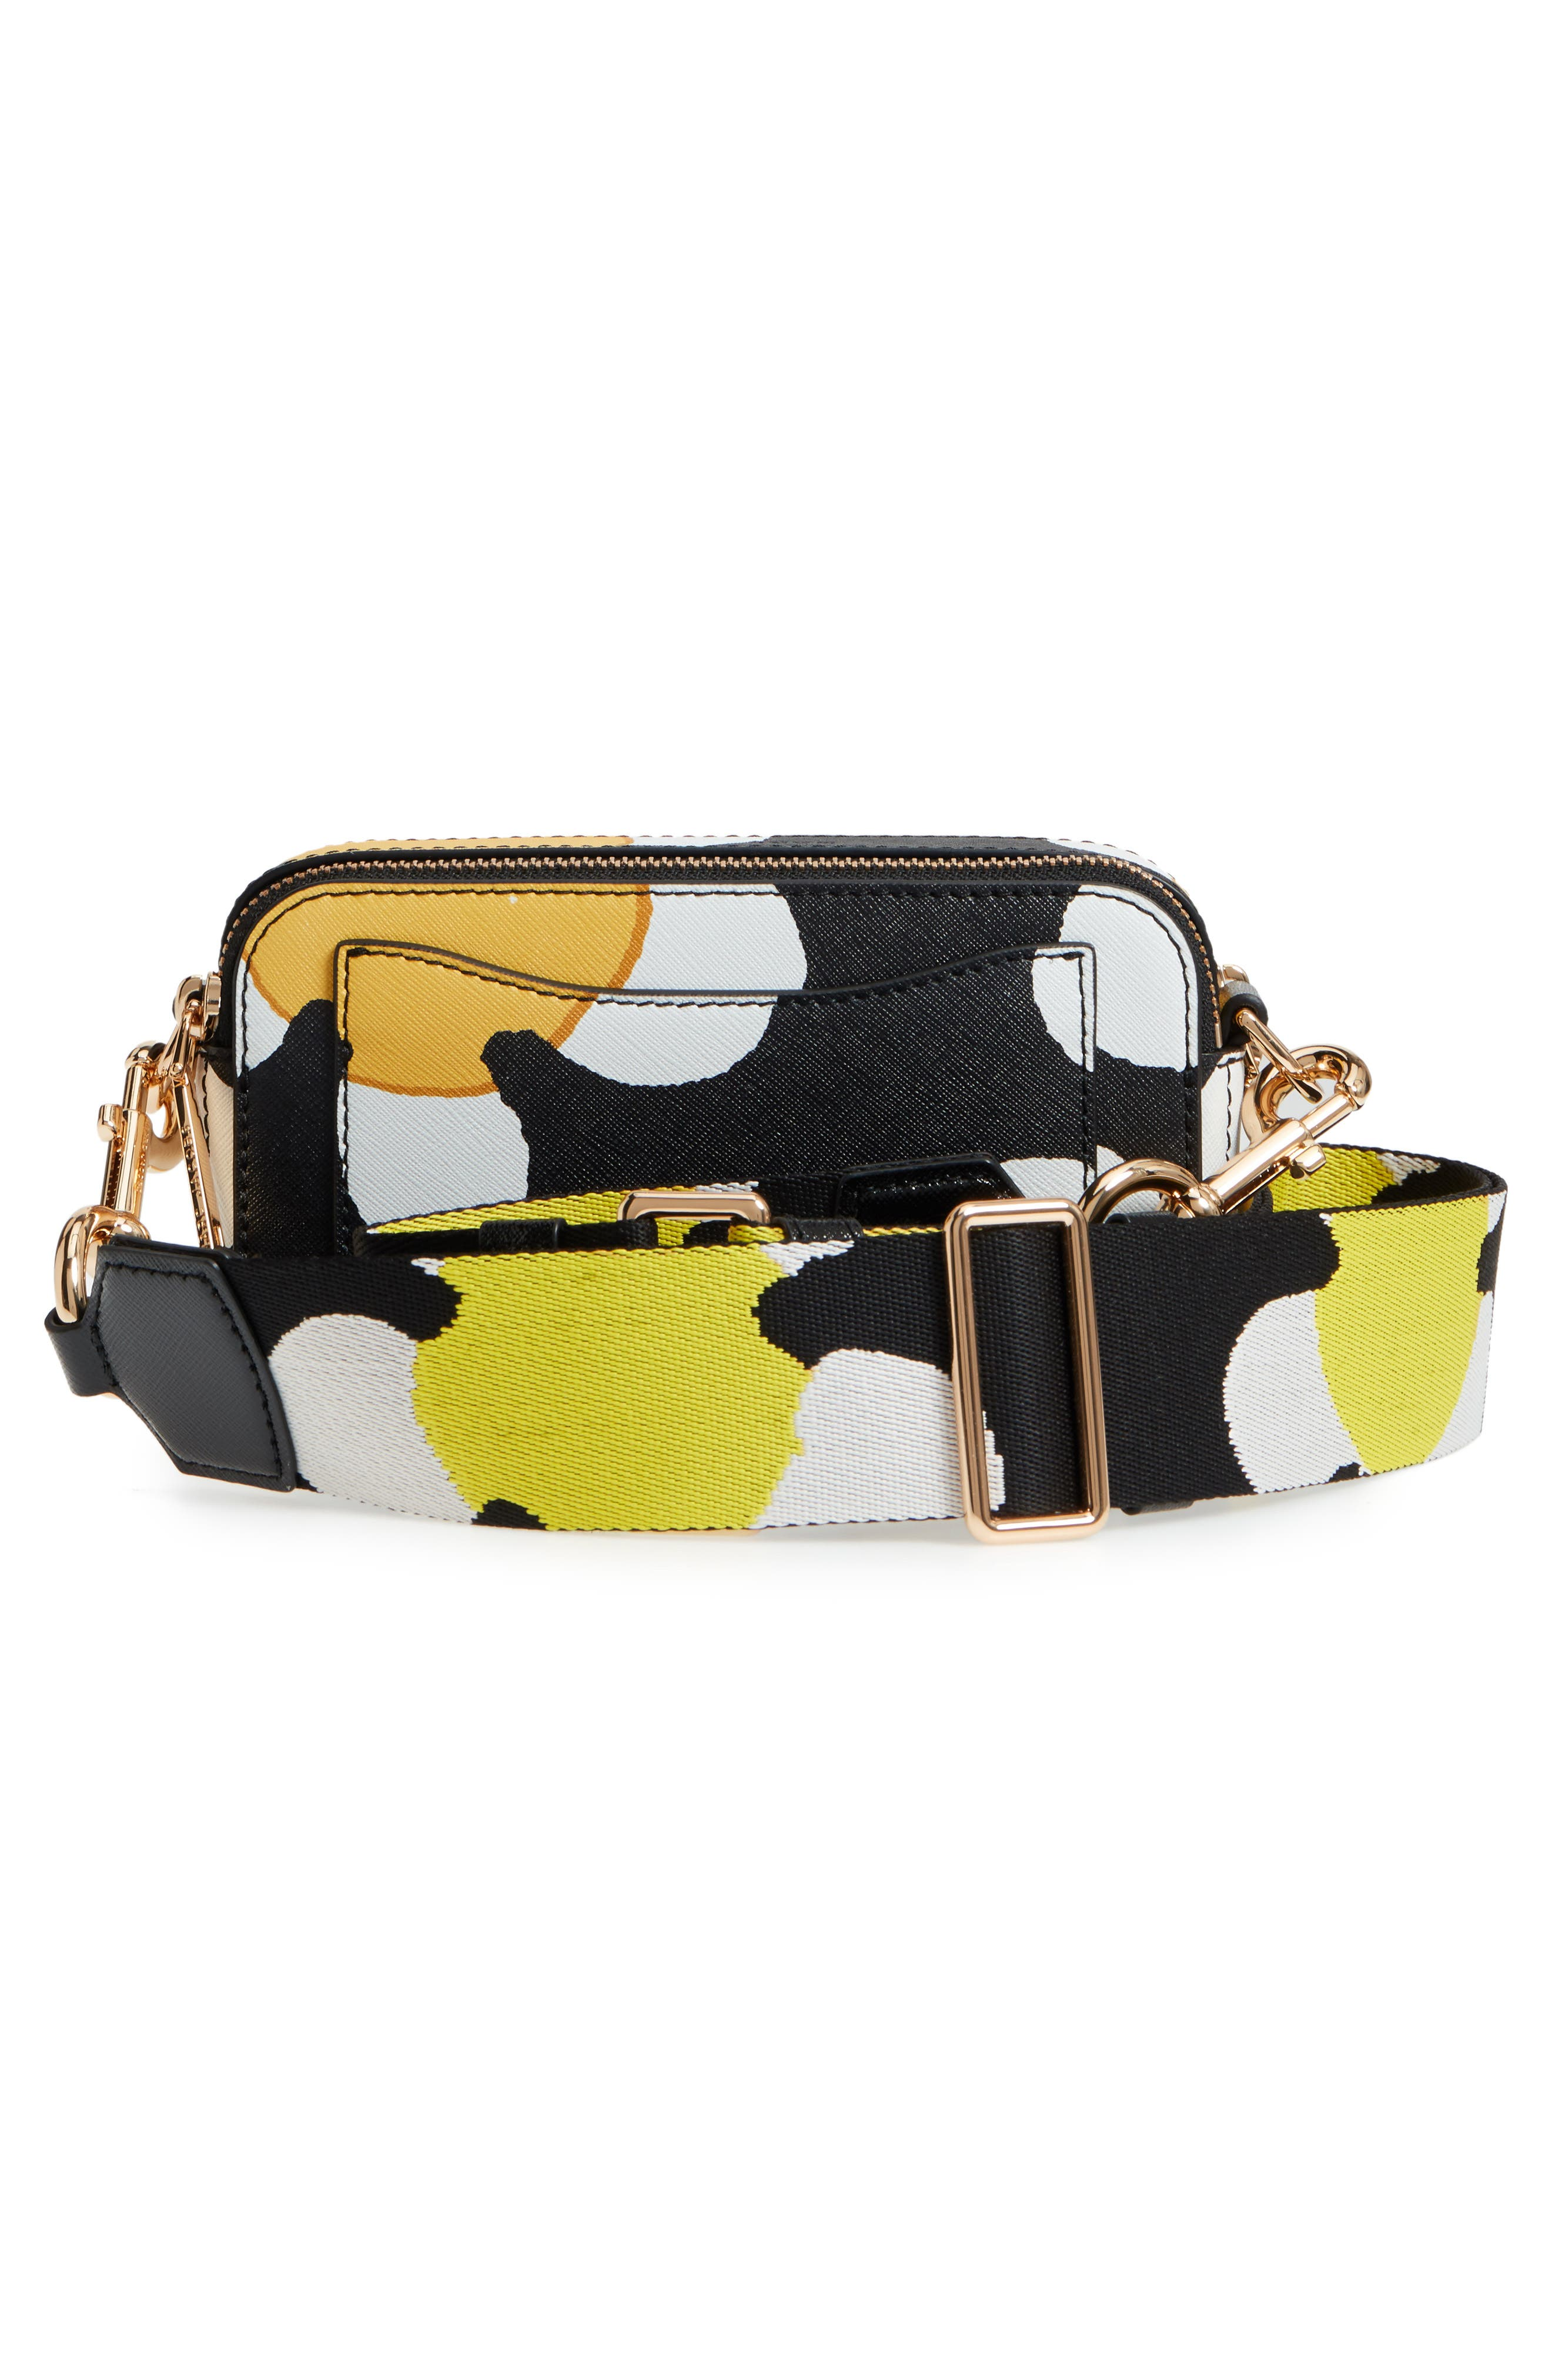 Snapshot Daisy Print Leather Crossbody Bag,                             Alternate thumbnail 3, color,                             YELLOW MULTI